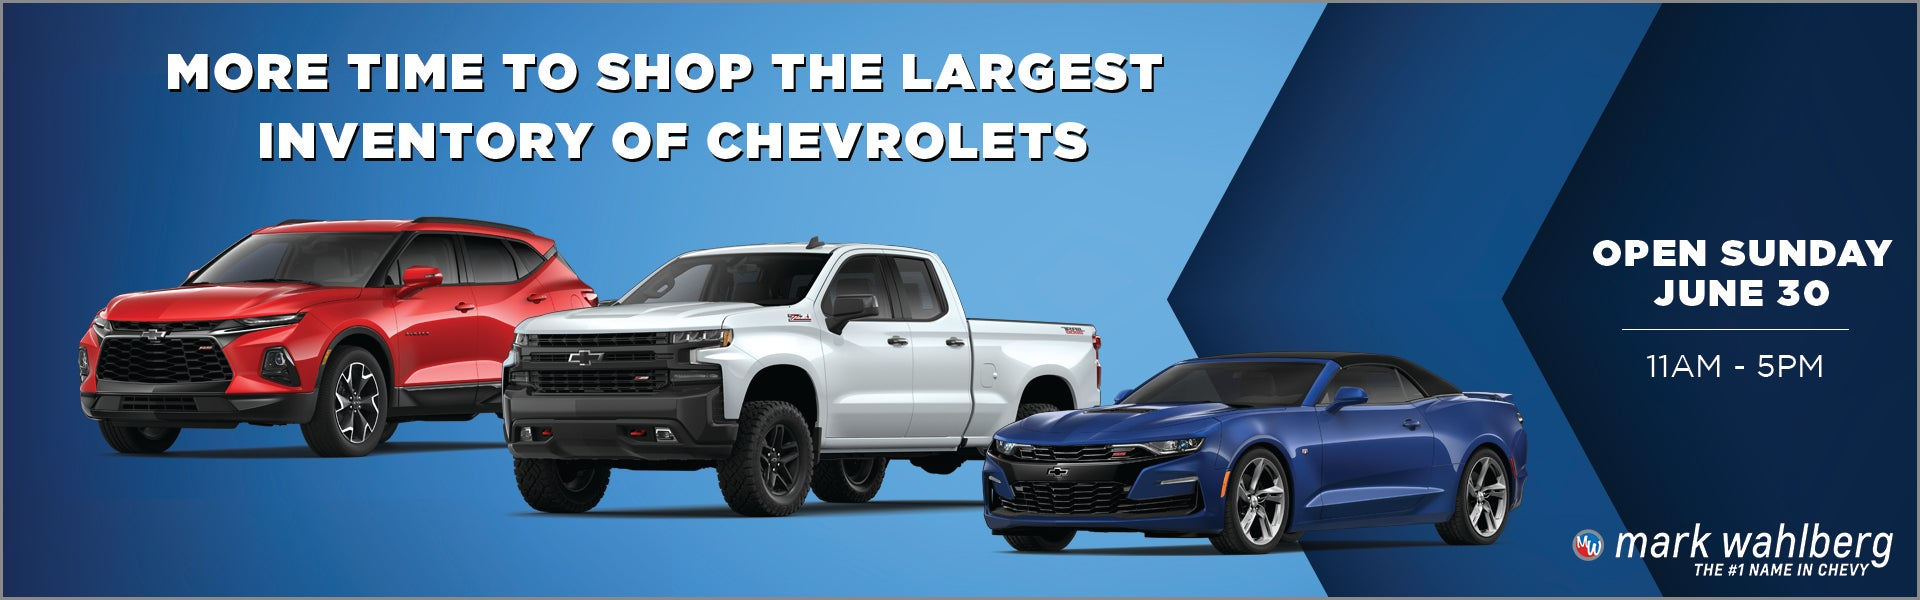 Chevy Dealer Columbus OH   Mark Wahlberg Chevrolet